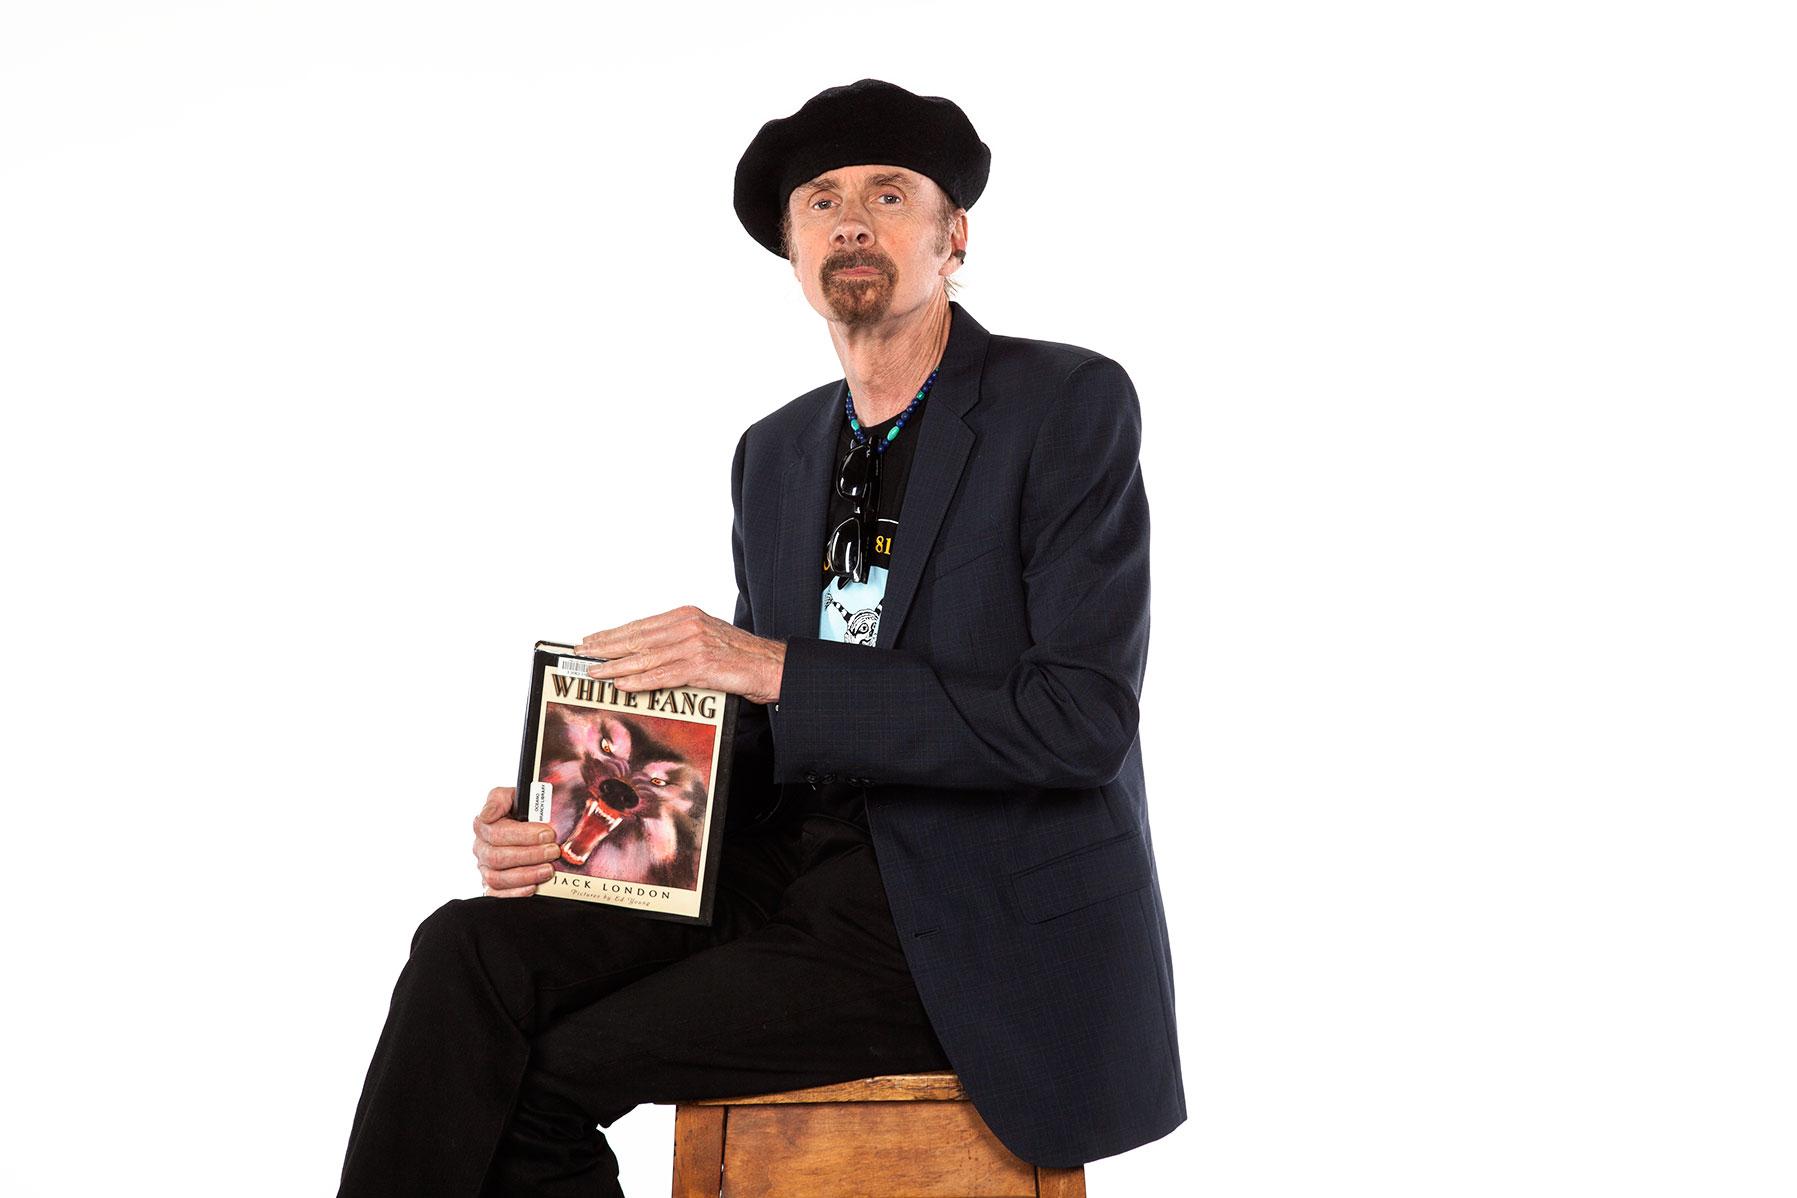 TC Boyle: Literacy Advocate